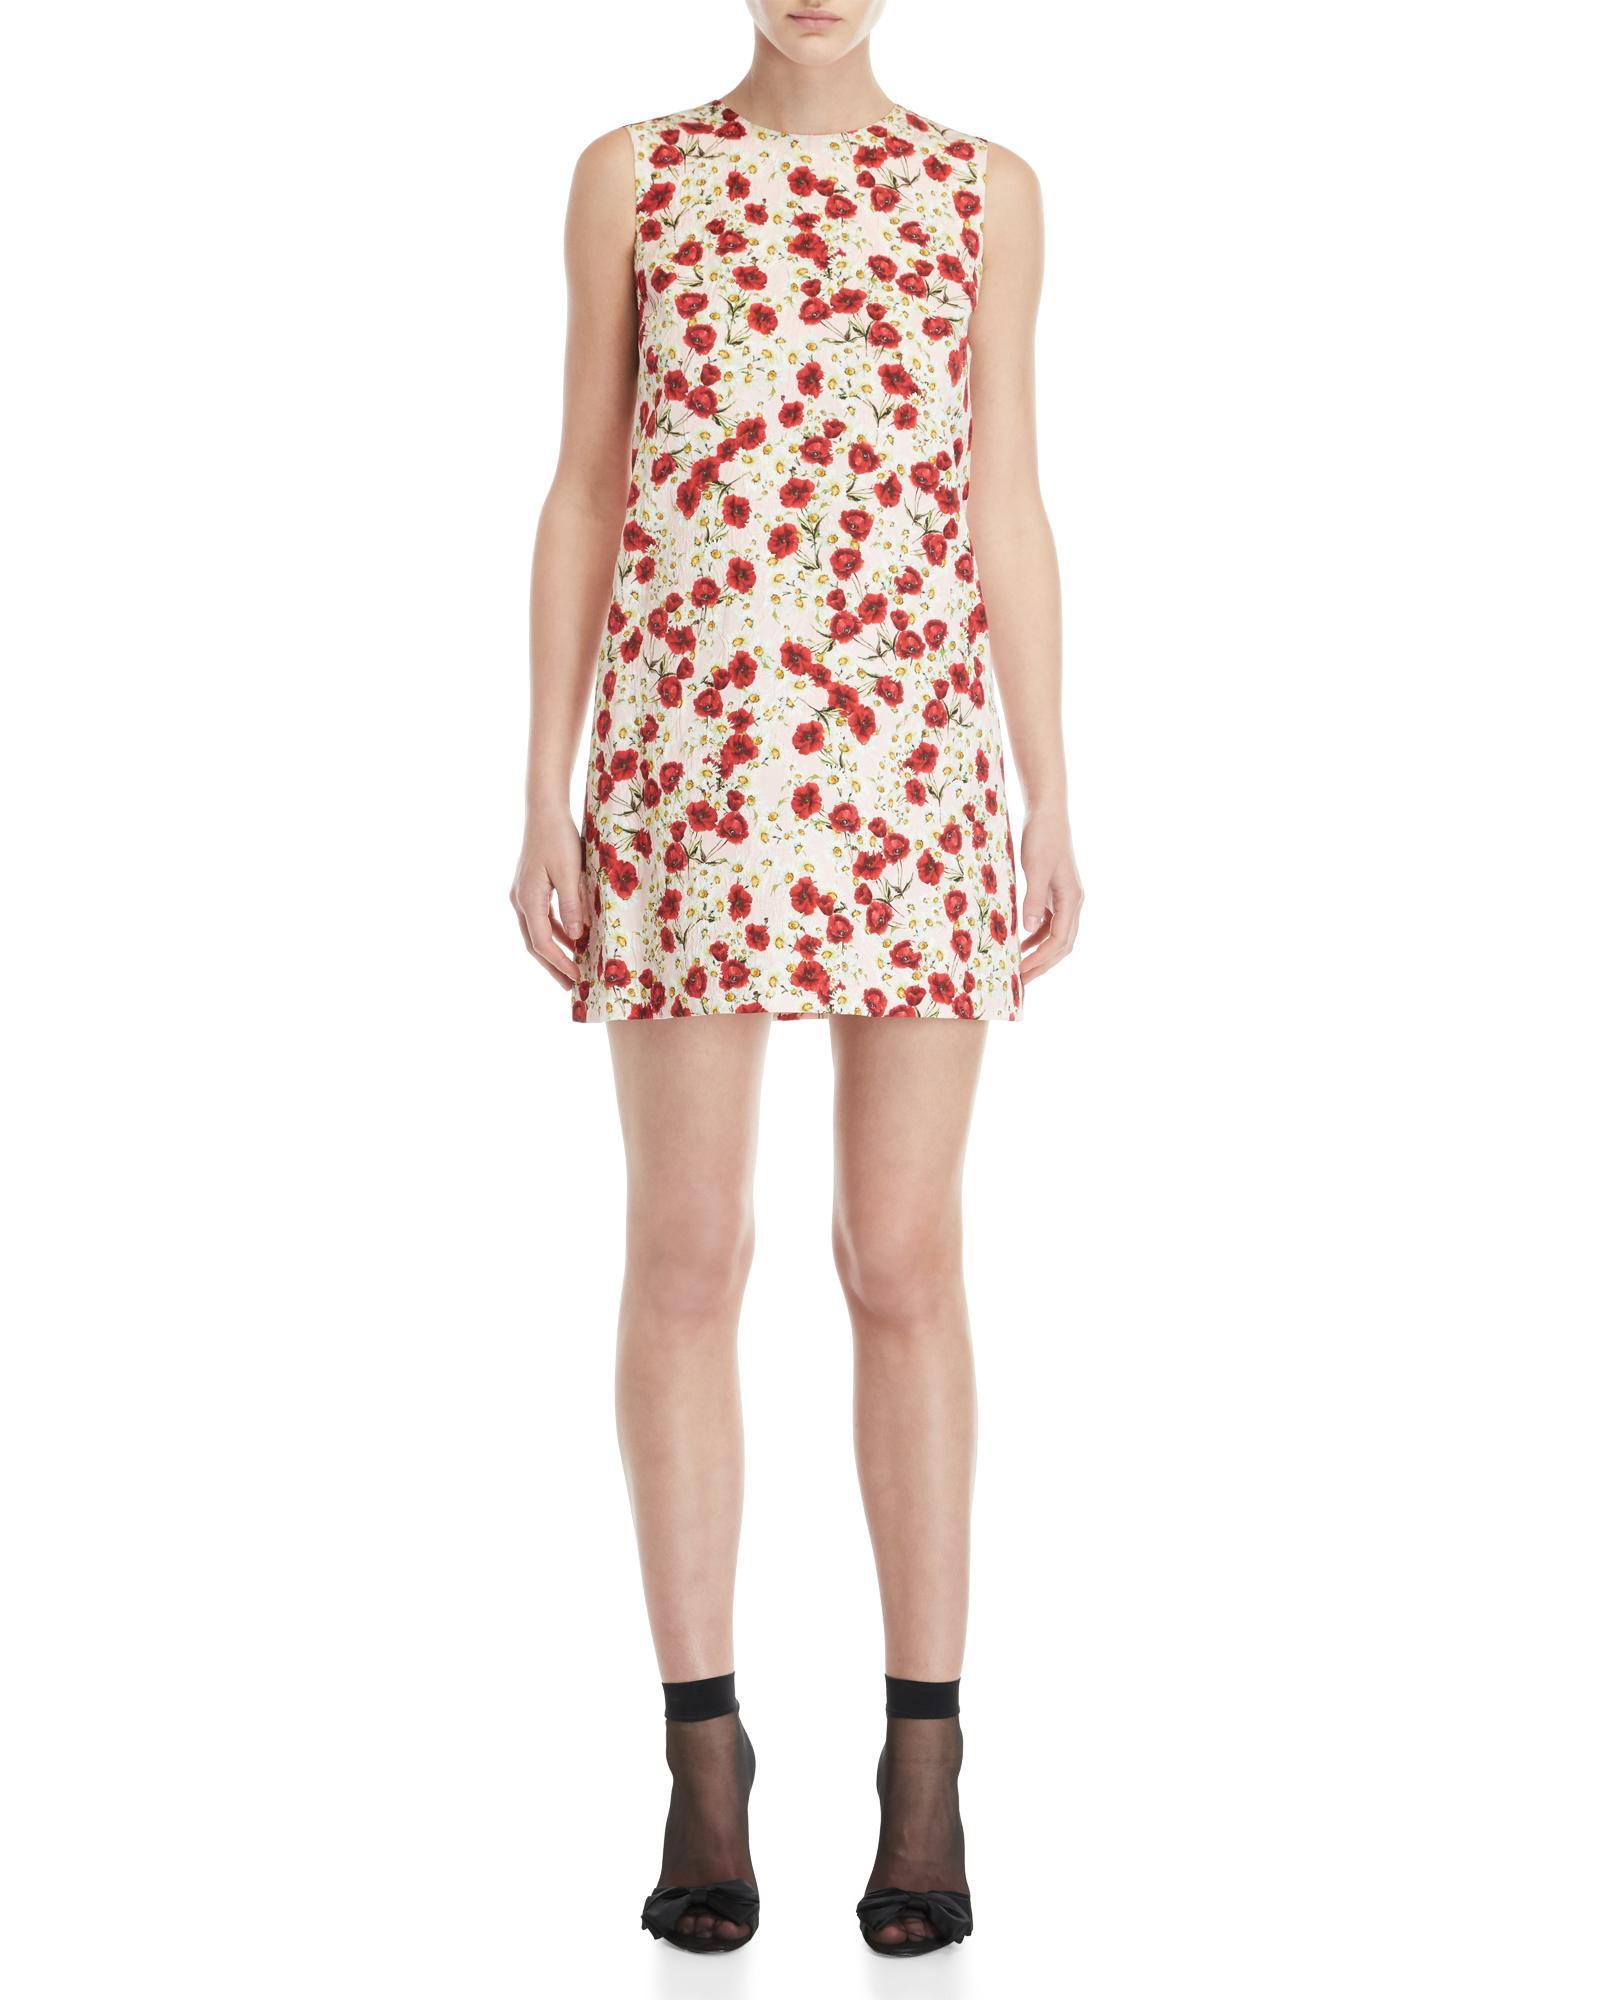 ab1e2273 Lyst - Dolce & Gabbana Floral Print Jacquard Mini Dress in Pink